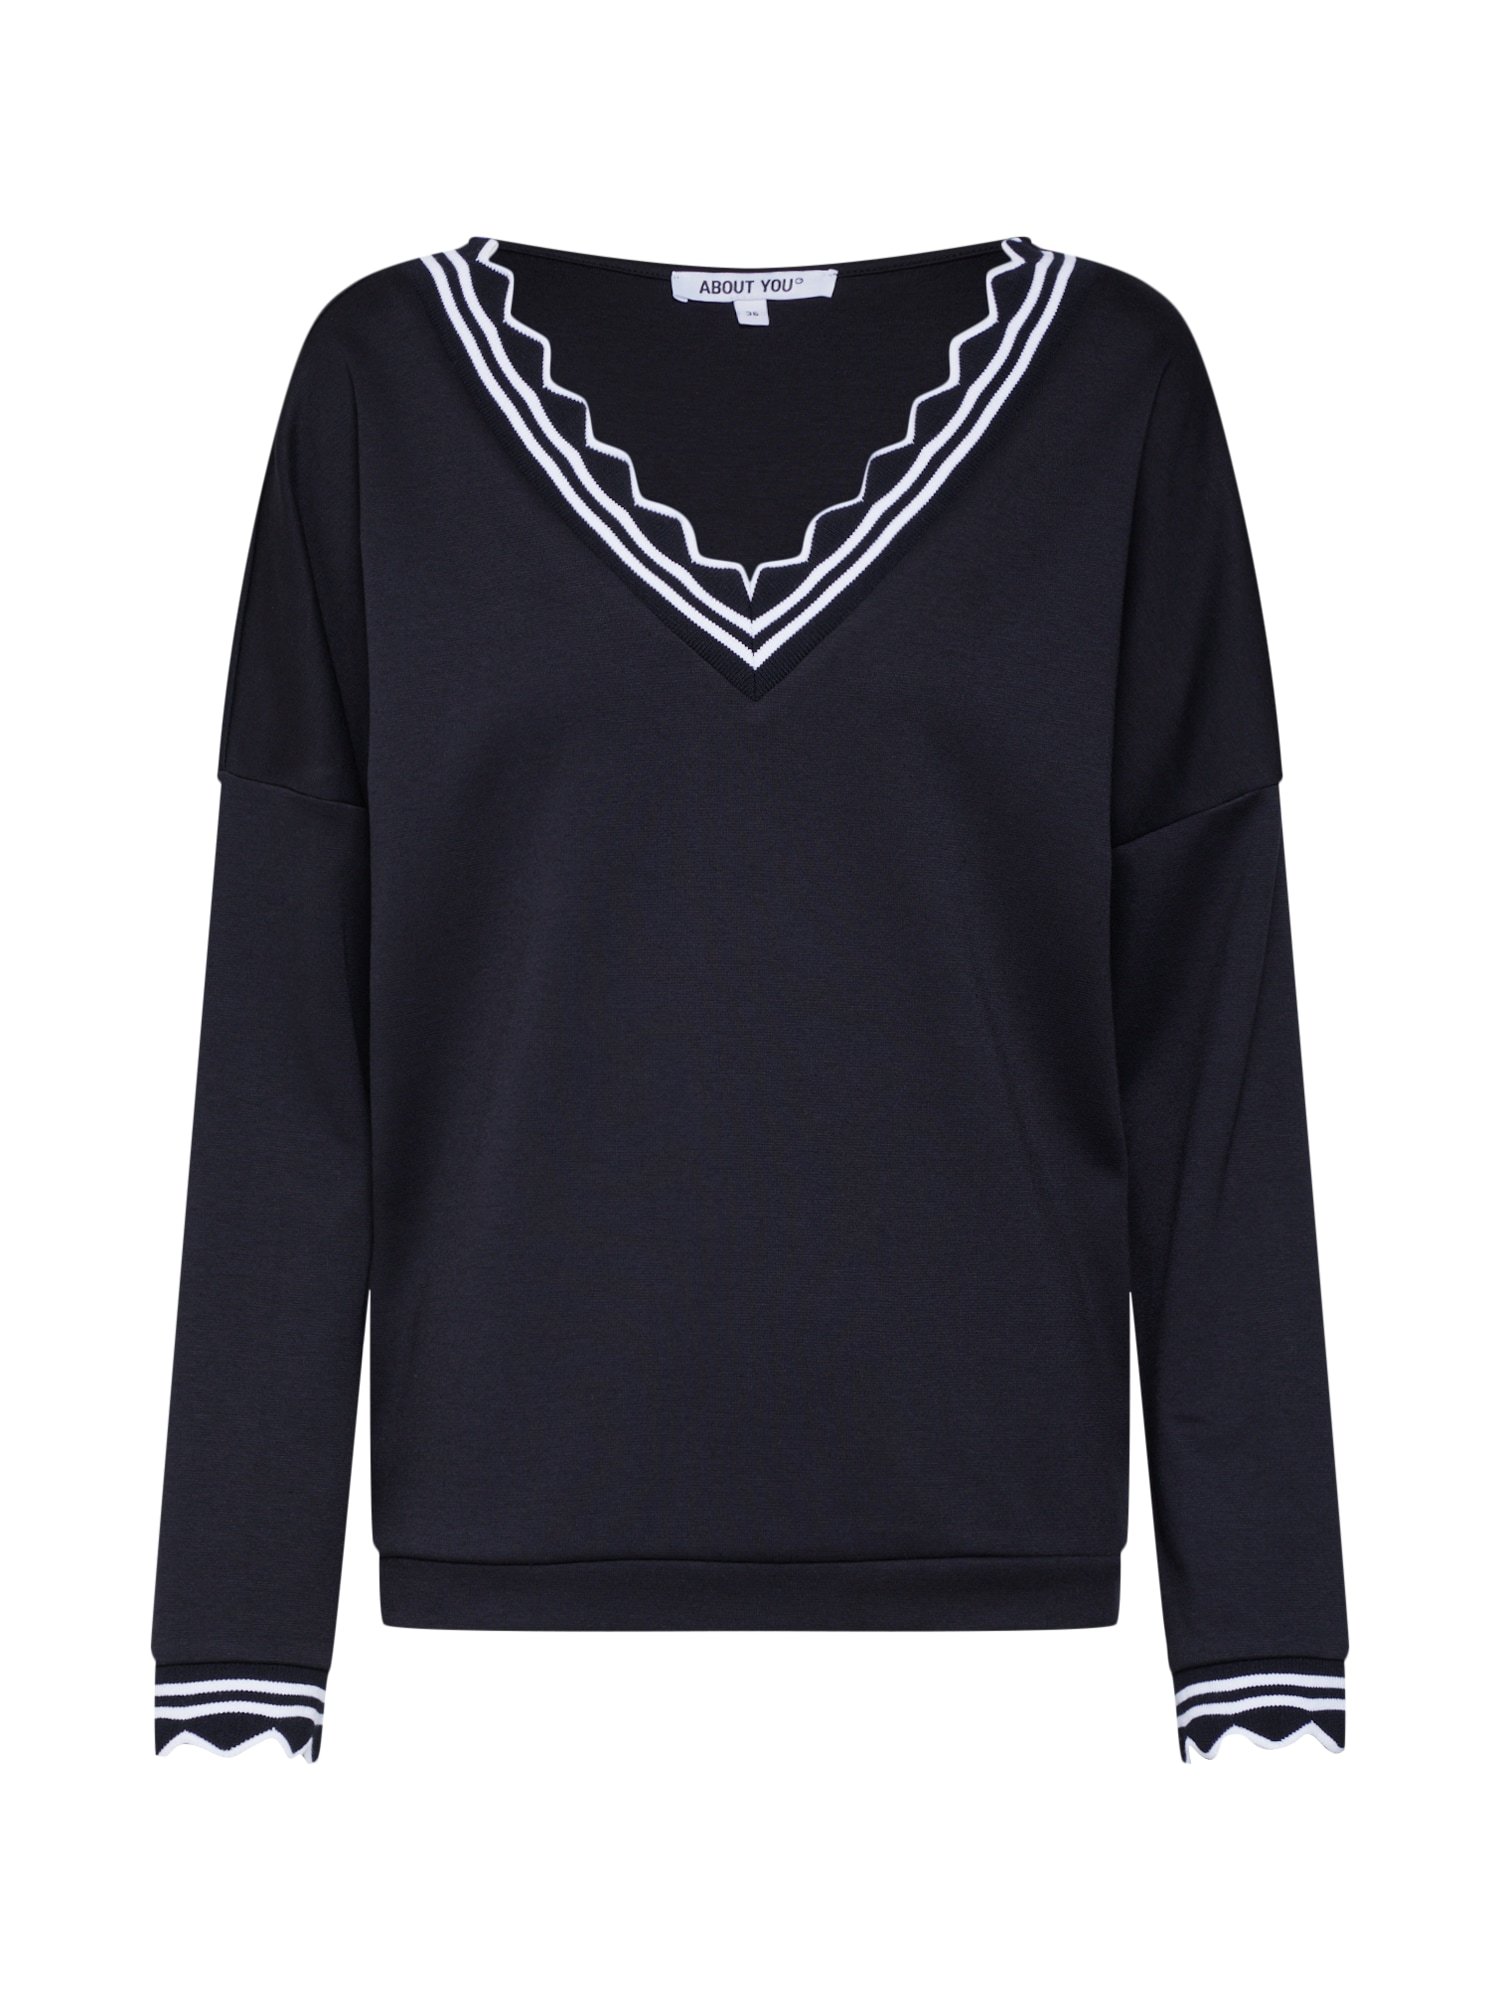 ABOUT YOU Megztinis 'Eleonore' juoda